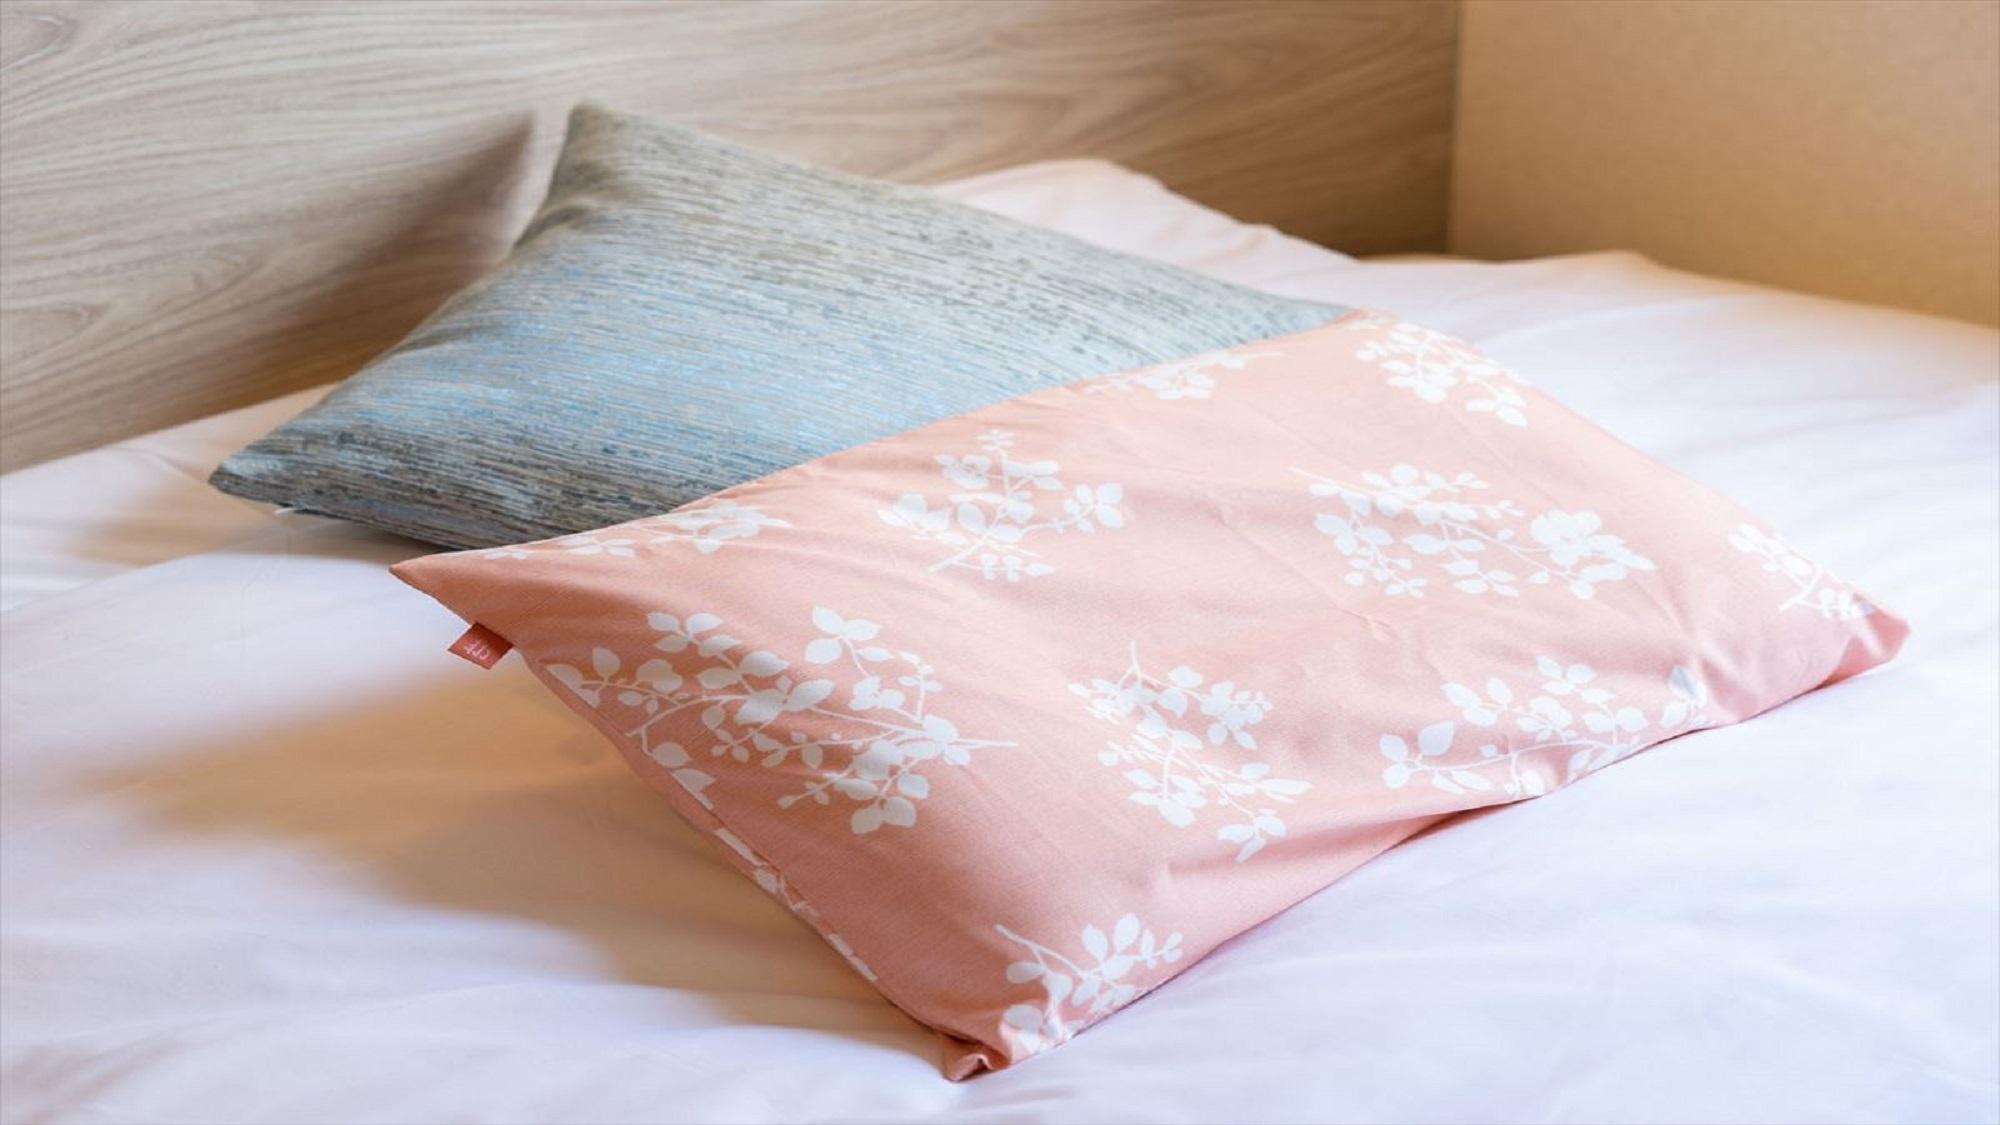 【Smart・貸出枕・数量限定・女性限定】女性のお身体に合った柔らかい枕でございます♪